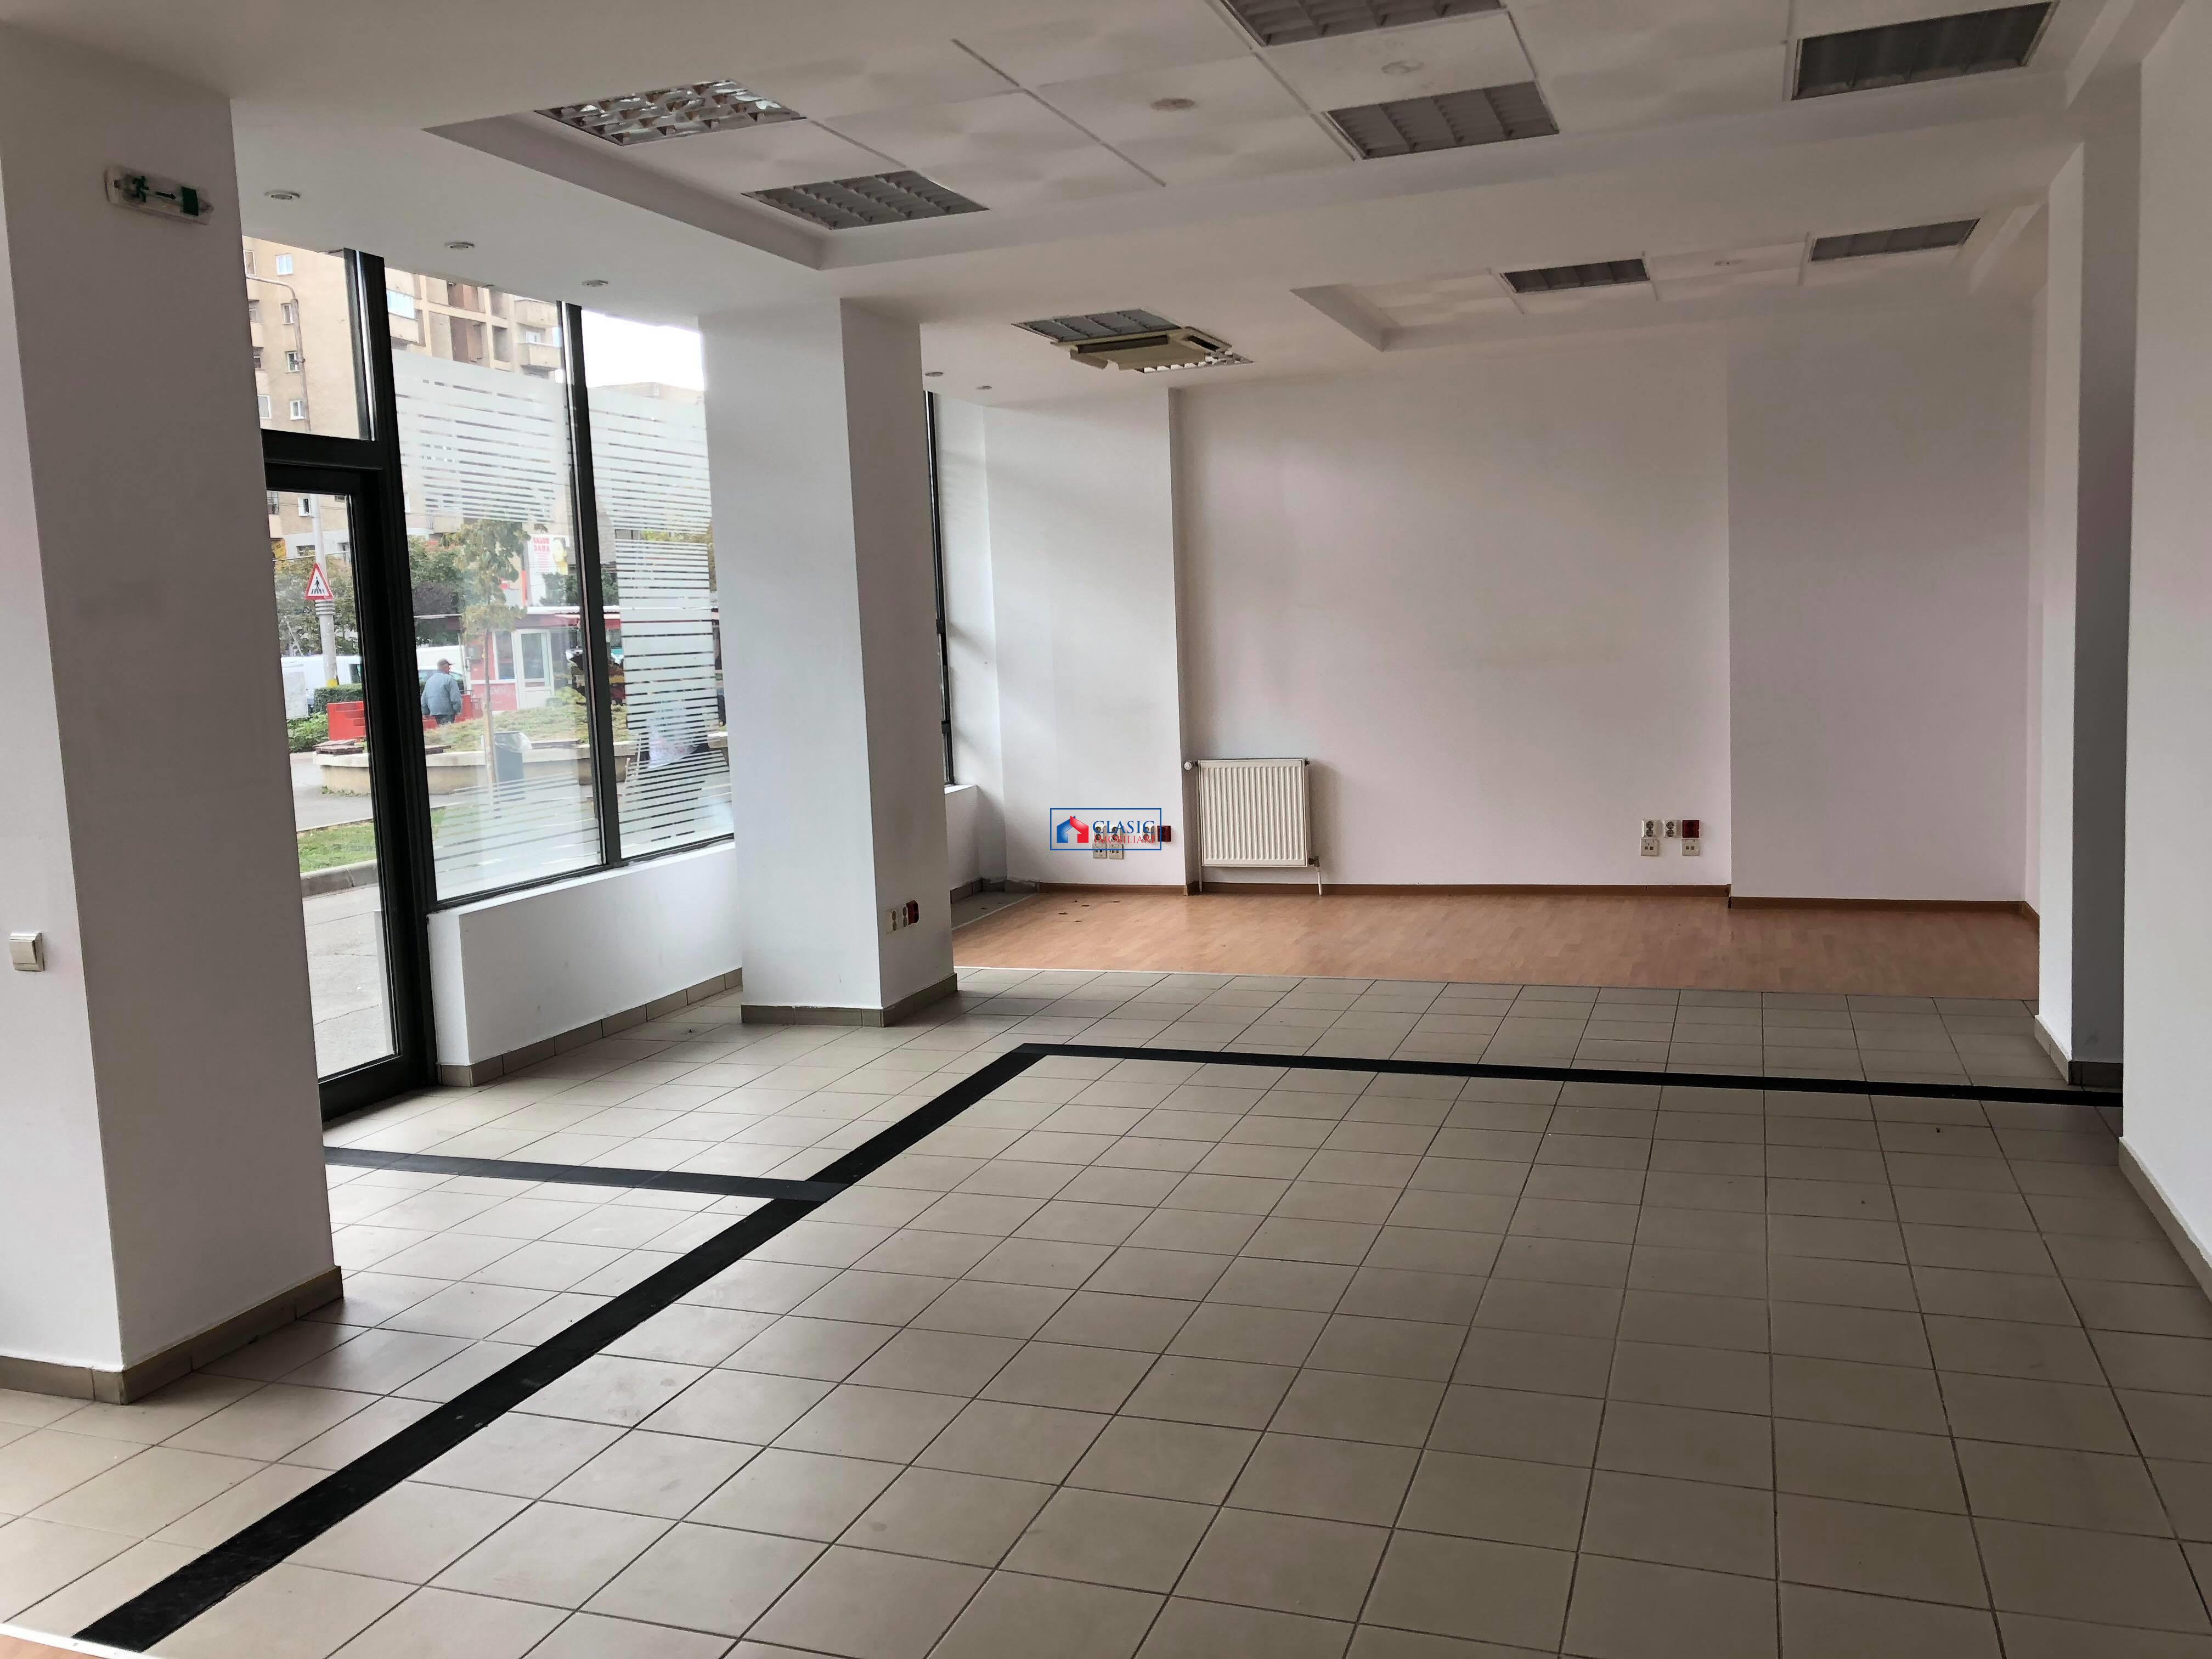 Inchiriere Spatiu comercial 117 mp in Marasti, Cluj Napoca